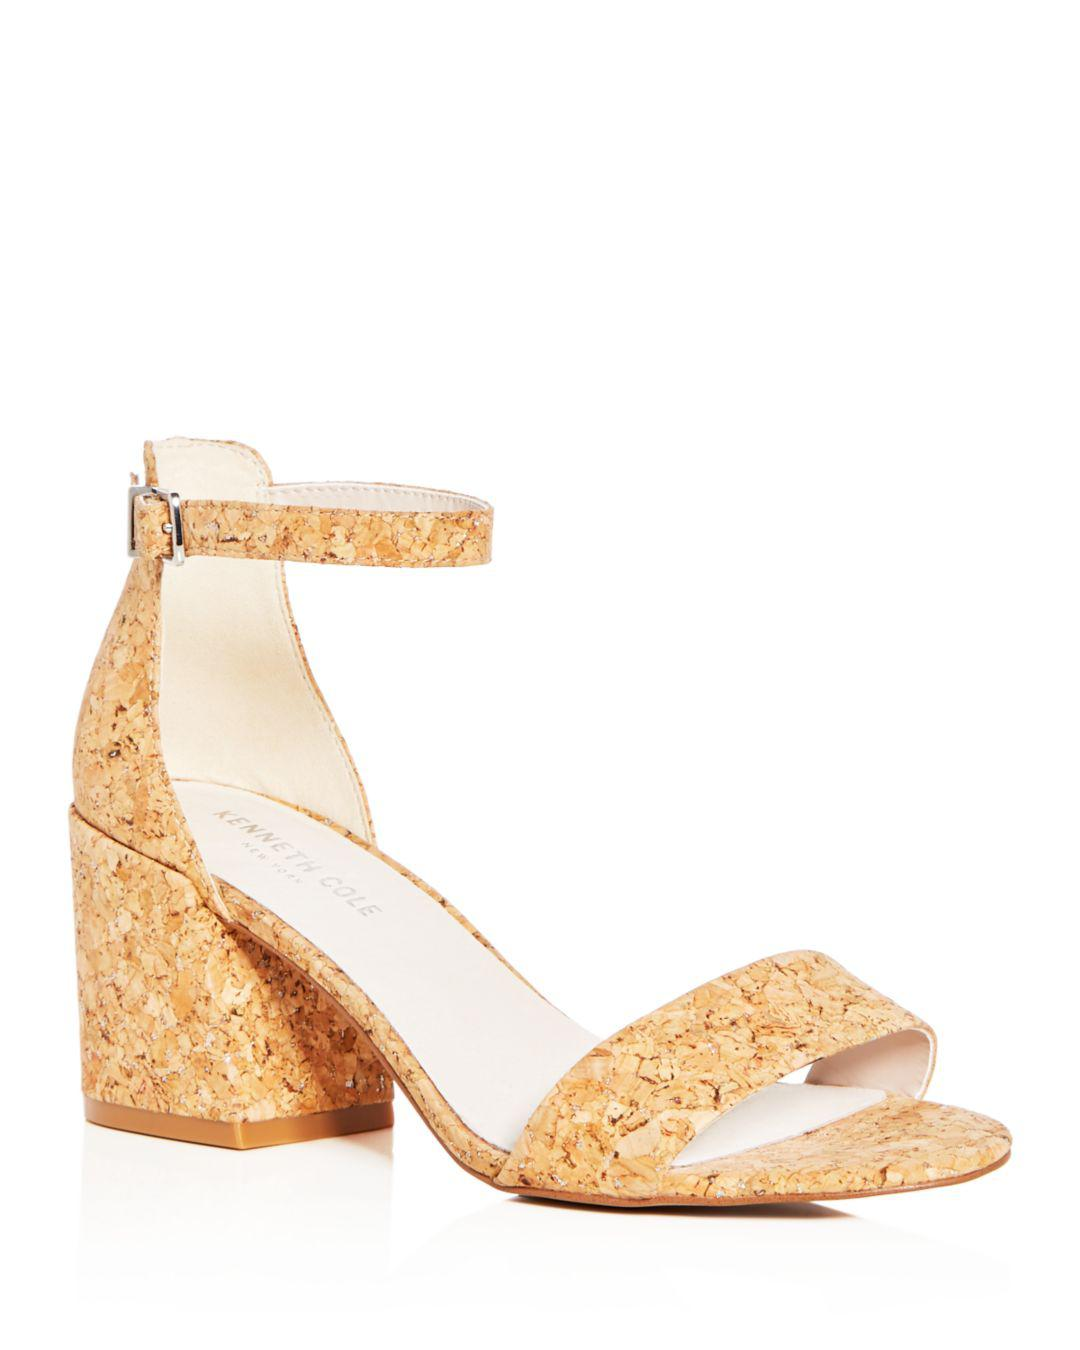 46fb819e0aef Kenneth Cole Women's Hannon Glitter Cork Ankle Strap Block Heel ...